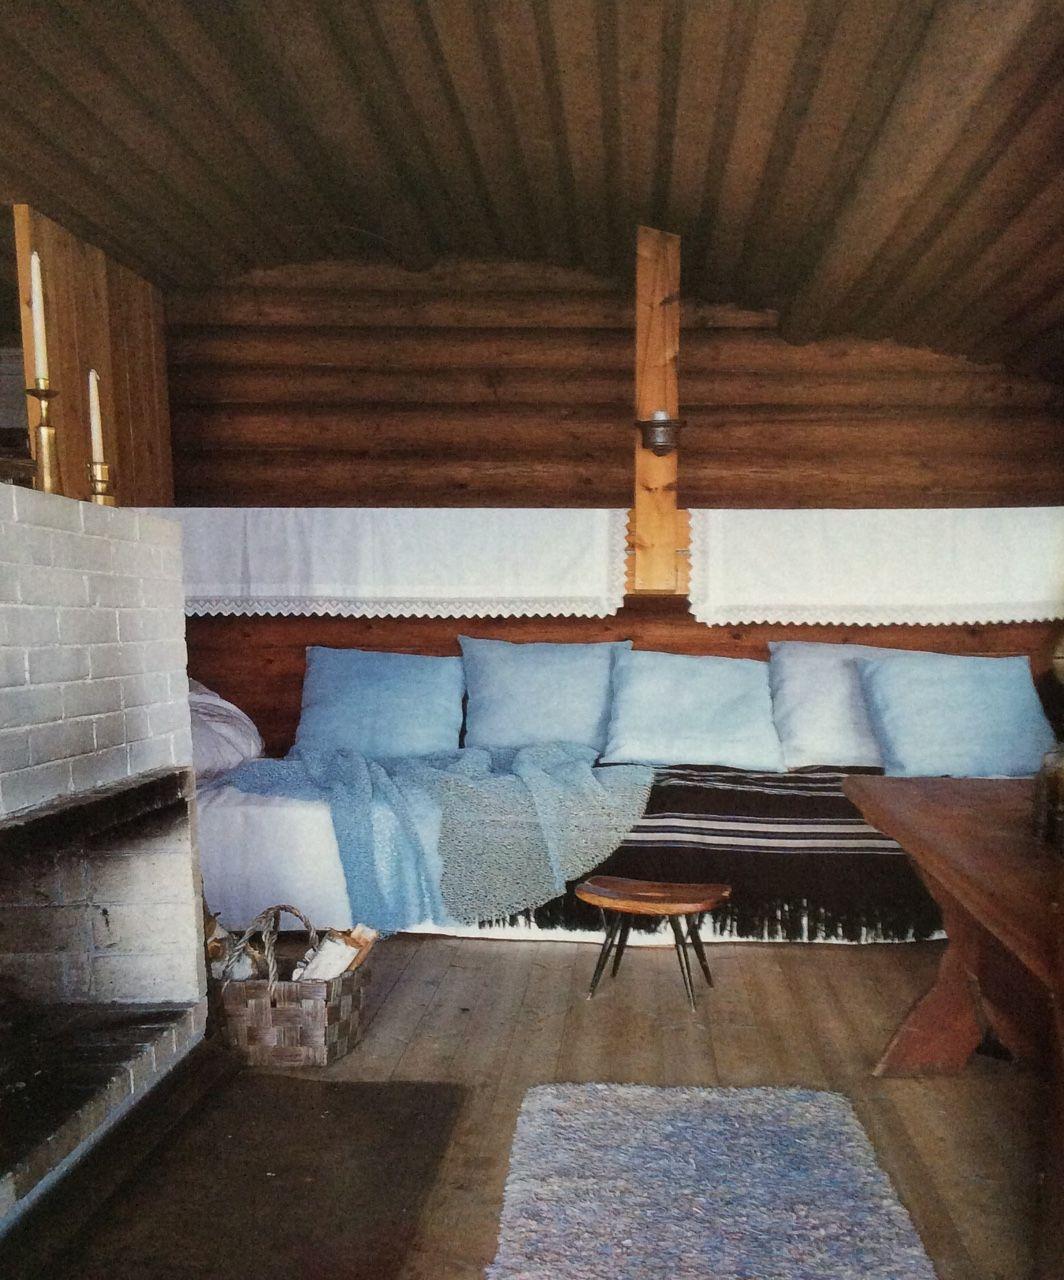 Country house of textile designer Ritva Puotila built in 1965, Finland. Pirkka stool designed by Ilmari Tapiovaara